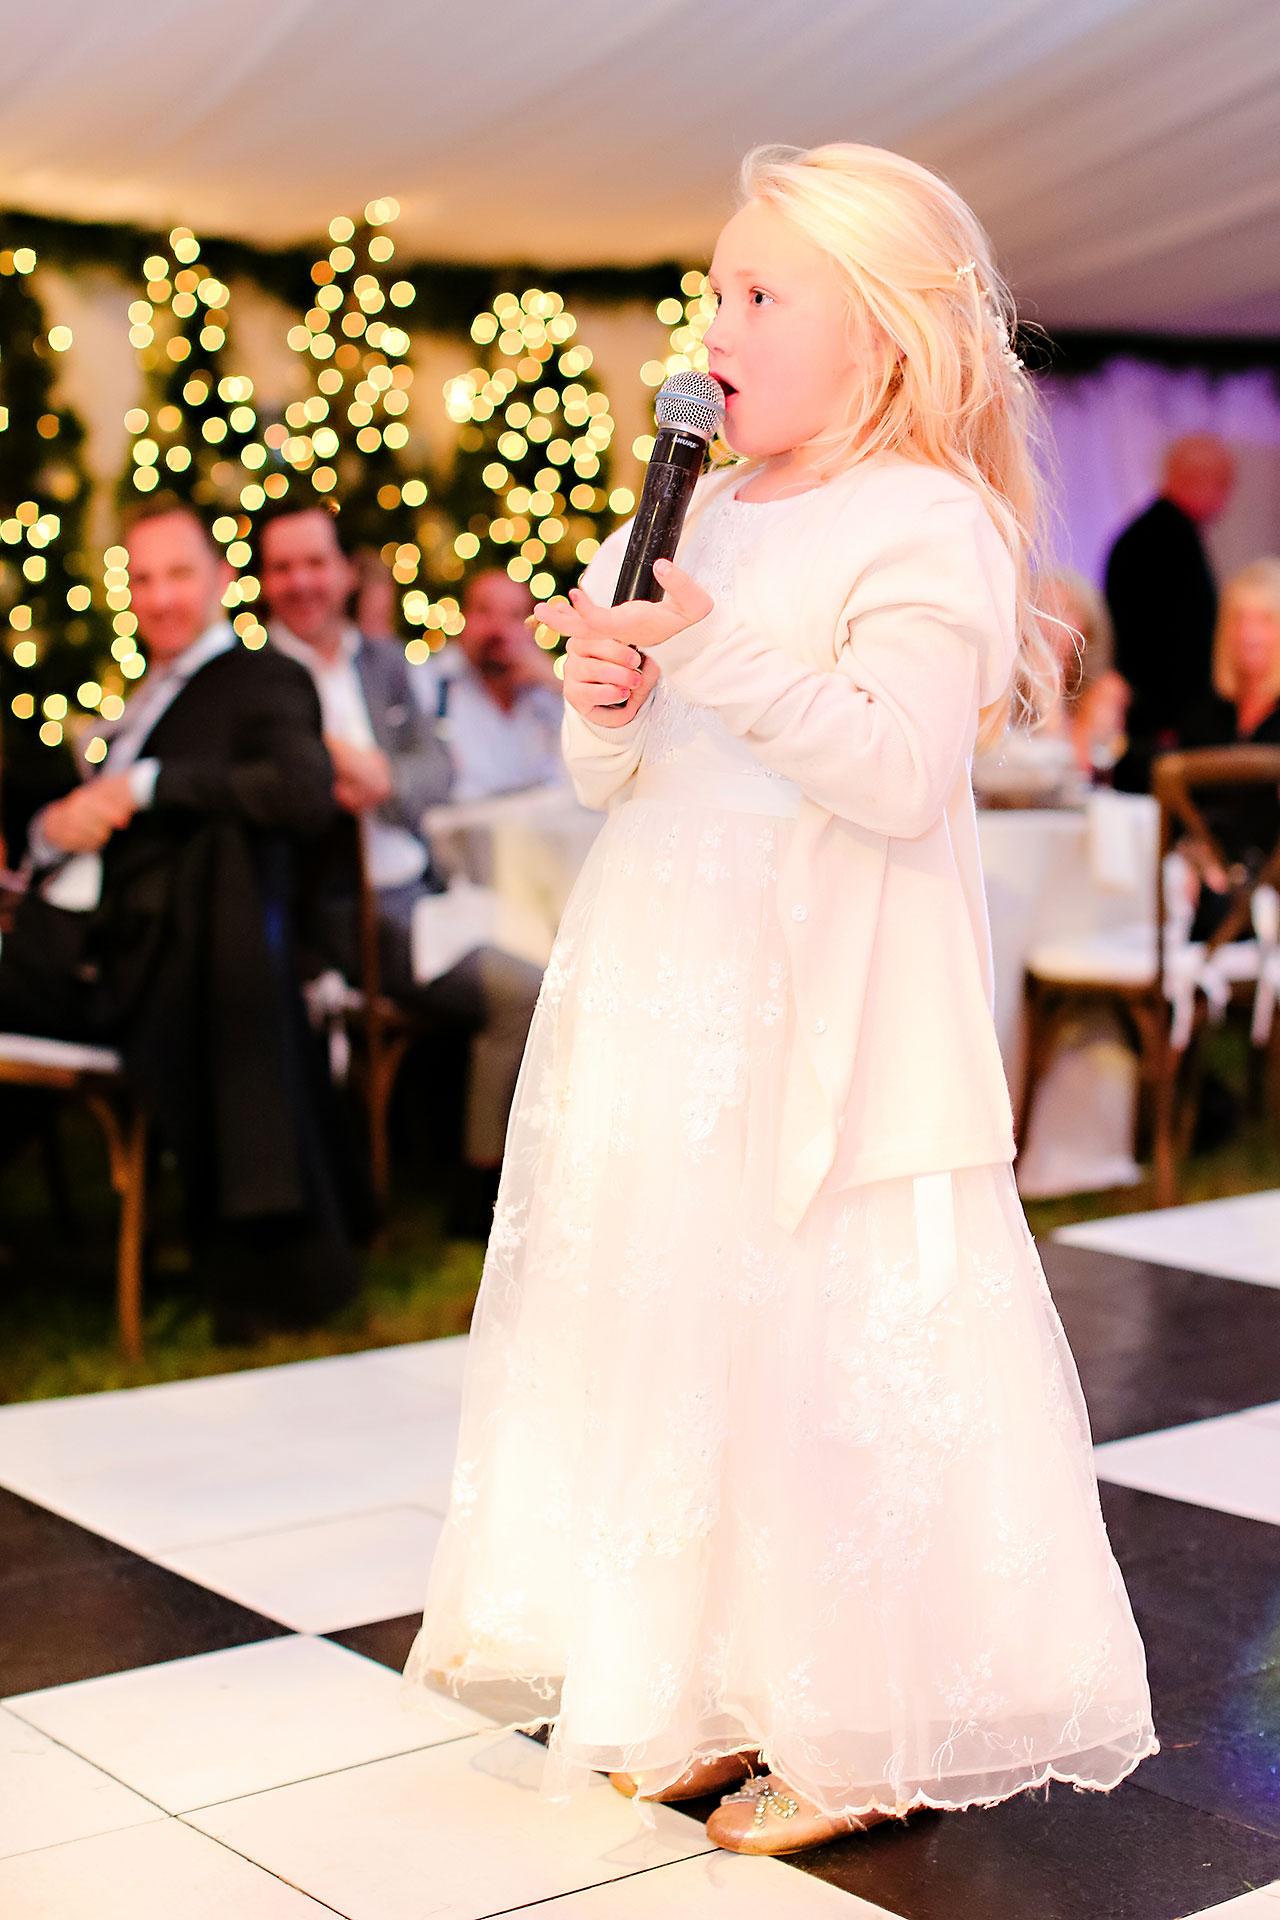 Ashley Steve Bloomington Indiana Wedding 352